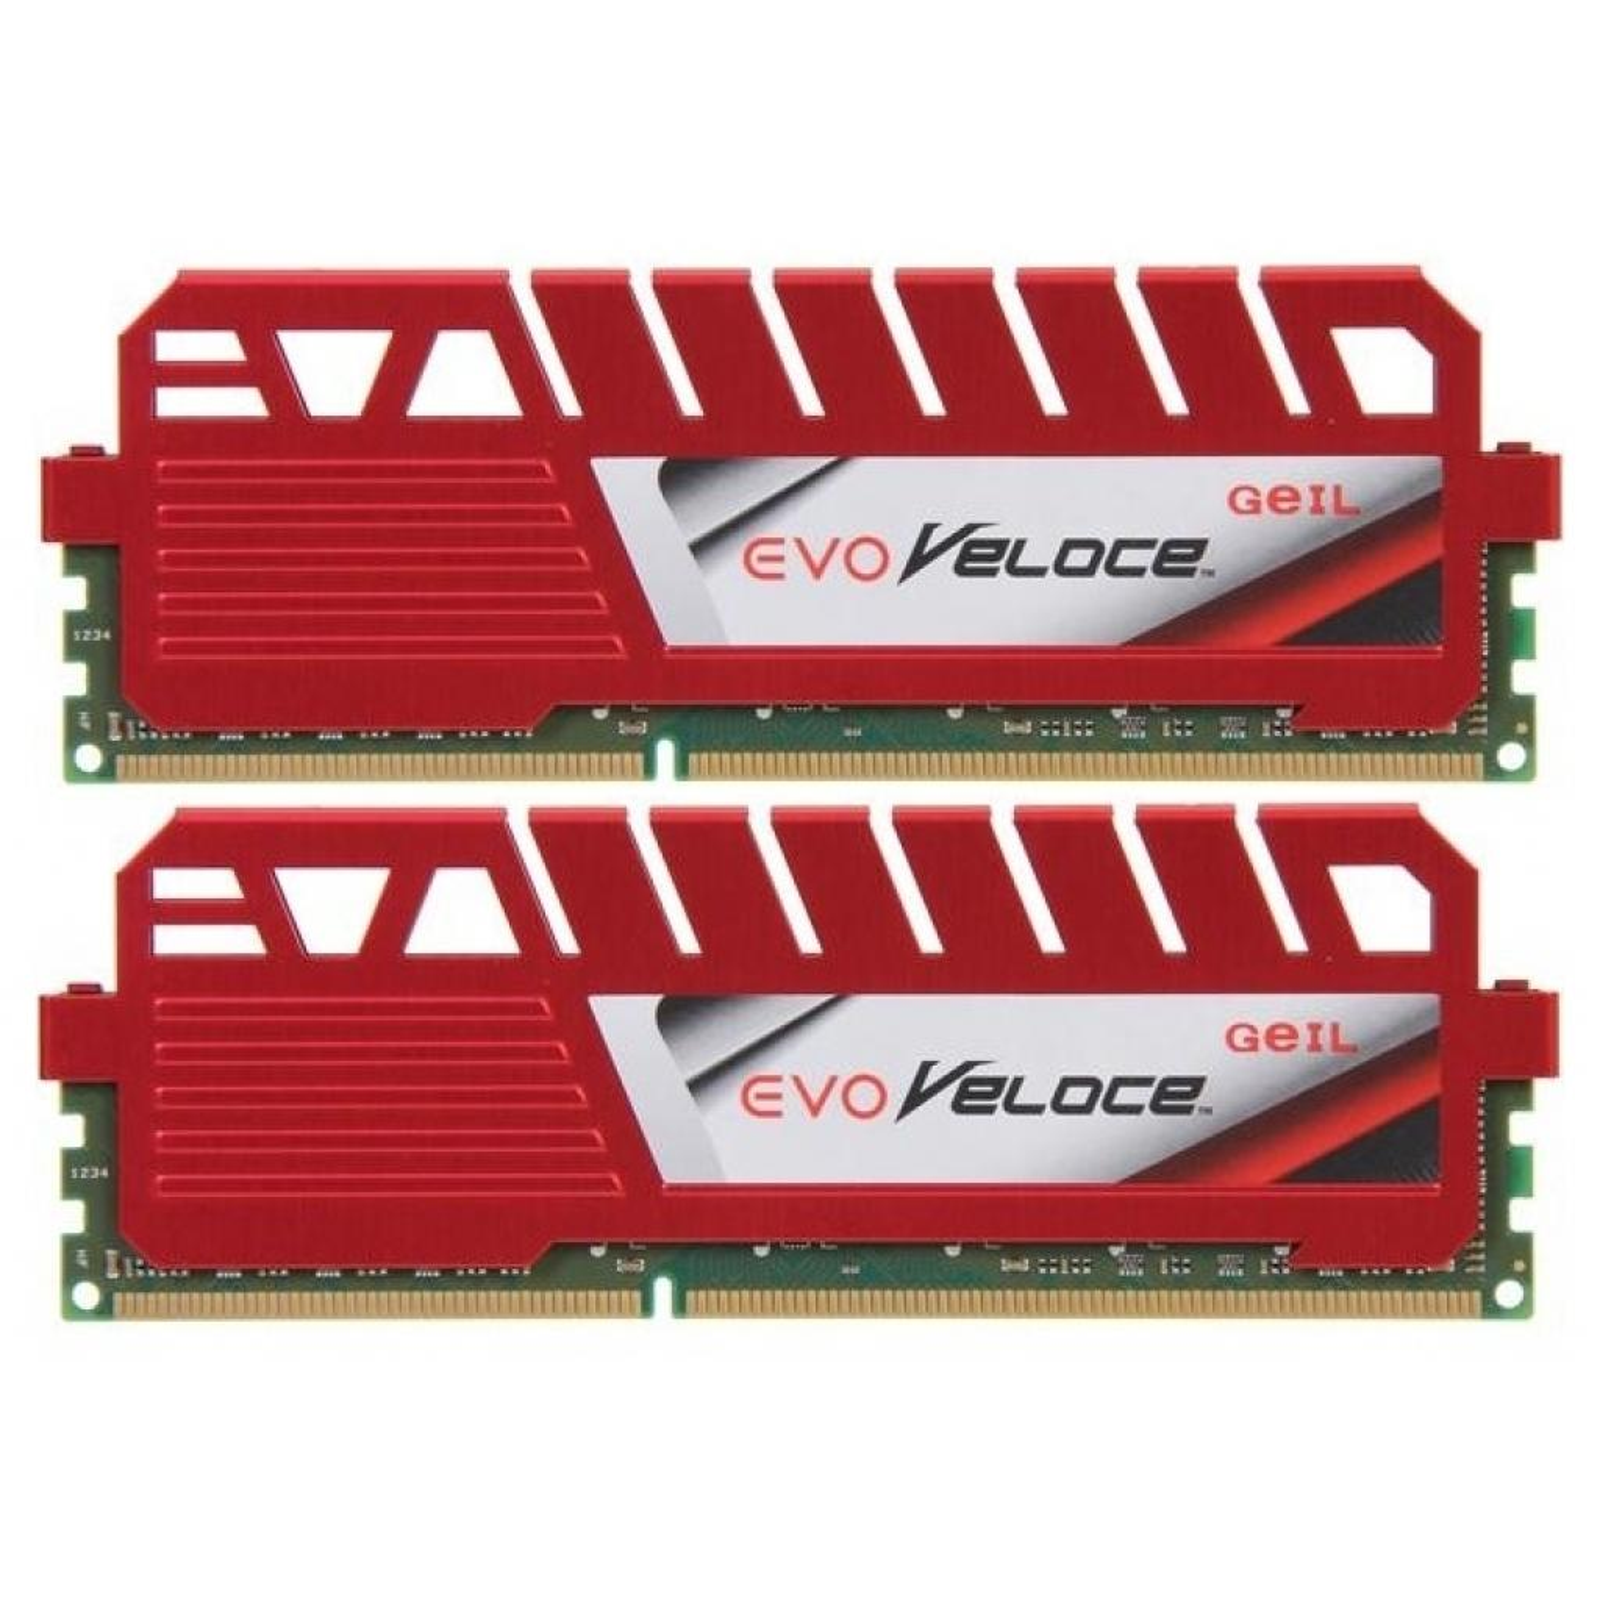 Модуль памяти для компьютера DDR3 16GB (2x8GB) 1600 MHz VELOCE Heatsink GEIL (GEV316GB1600C11DC)